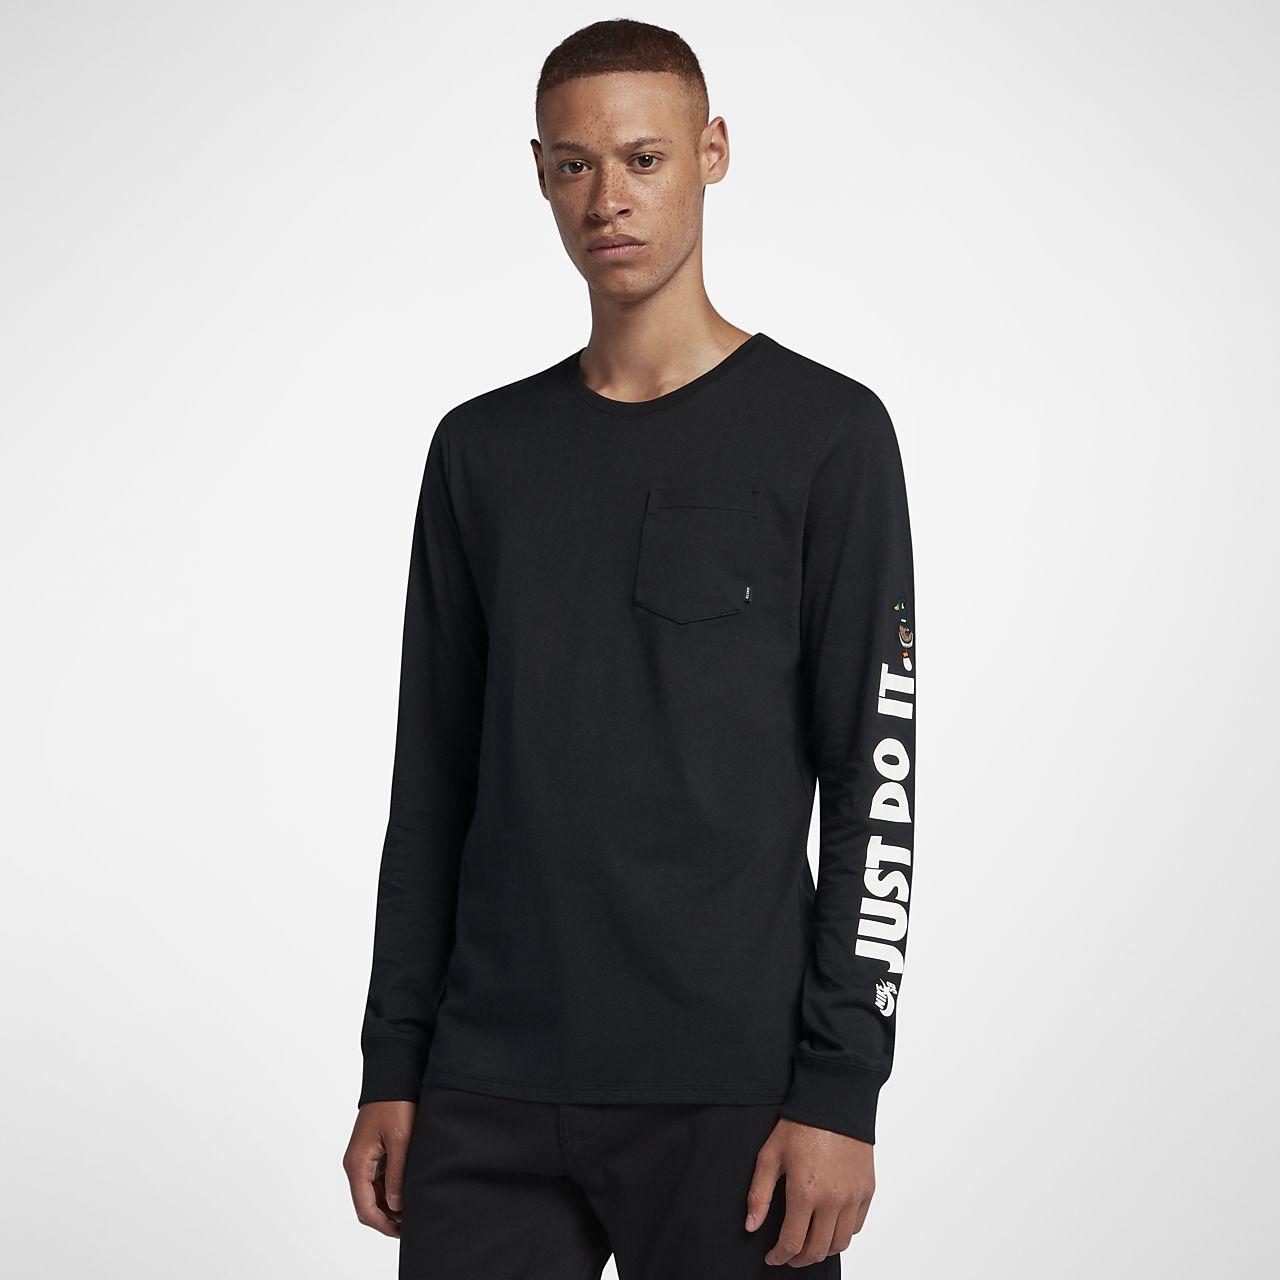 7ae99b7af9 Nike SB Men s Long-Sleeve Skateboarding T-Shirt. Nike.com